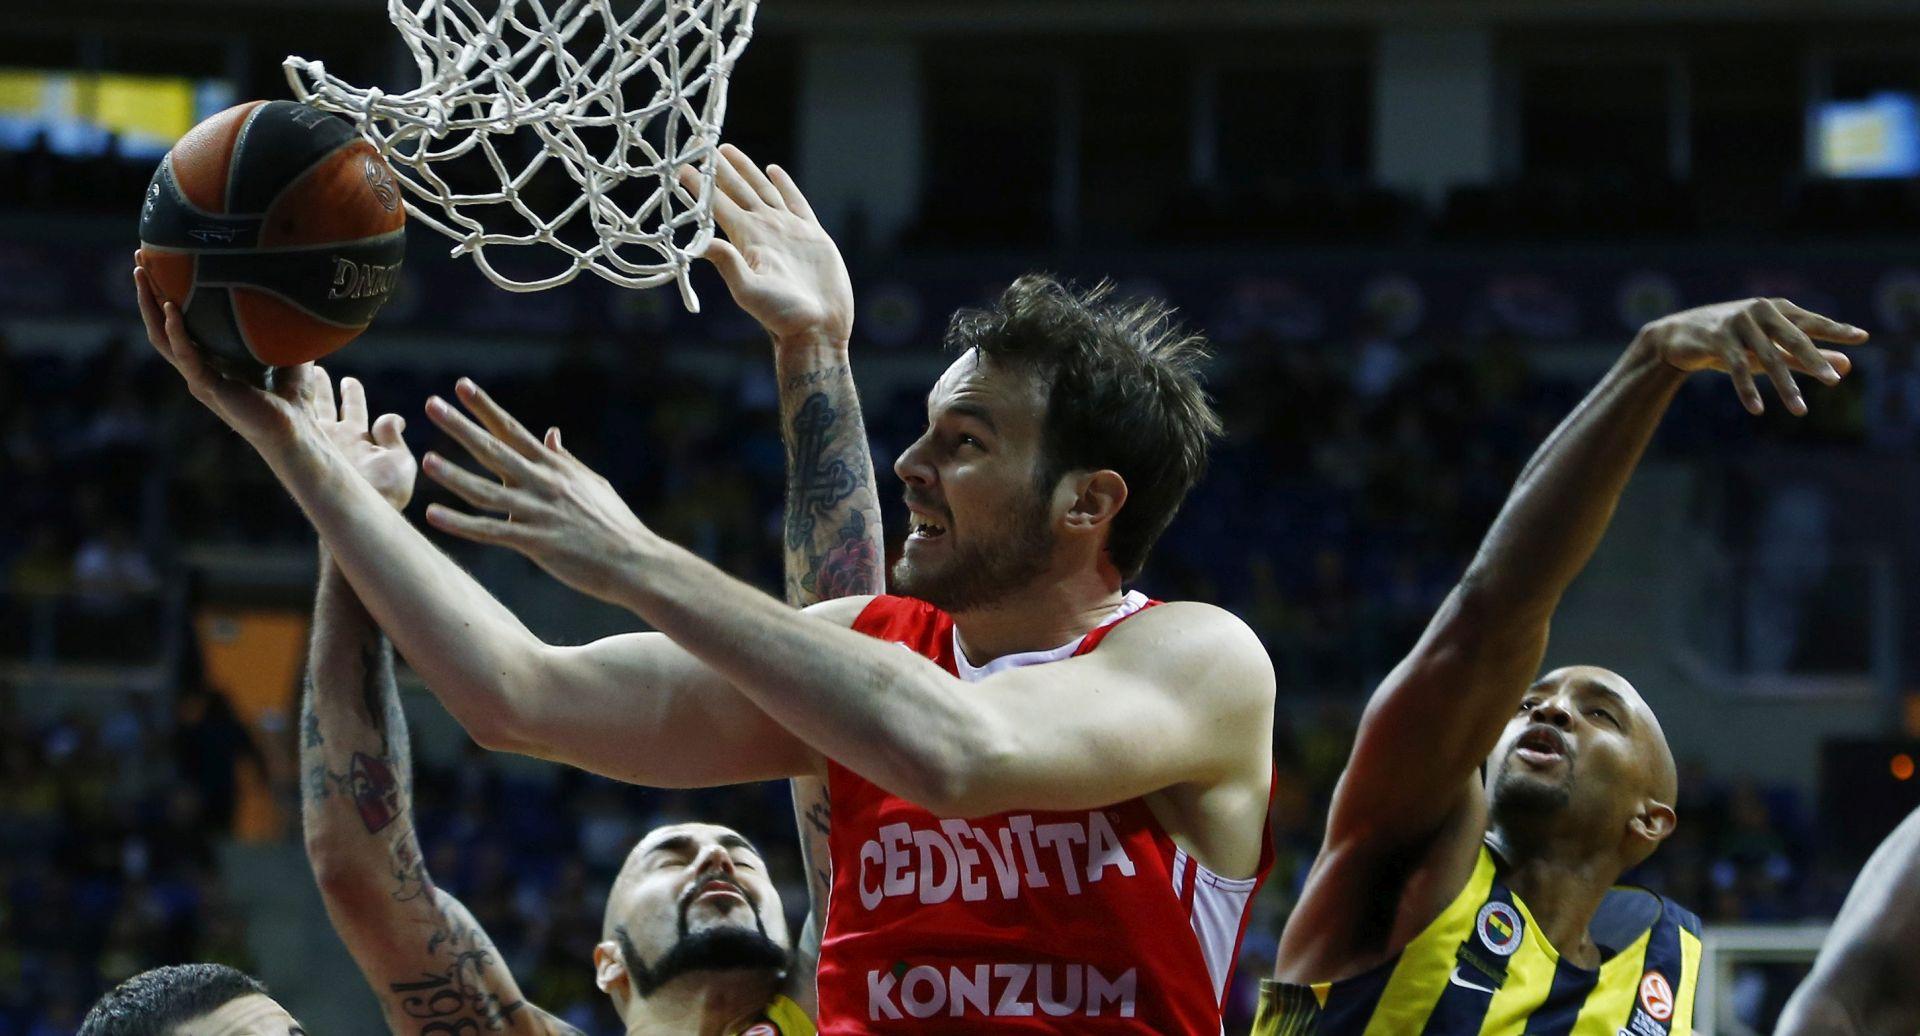 ZBOG OZLJEDE: Cedevita na Panathinaikos bez Luke Babića